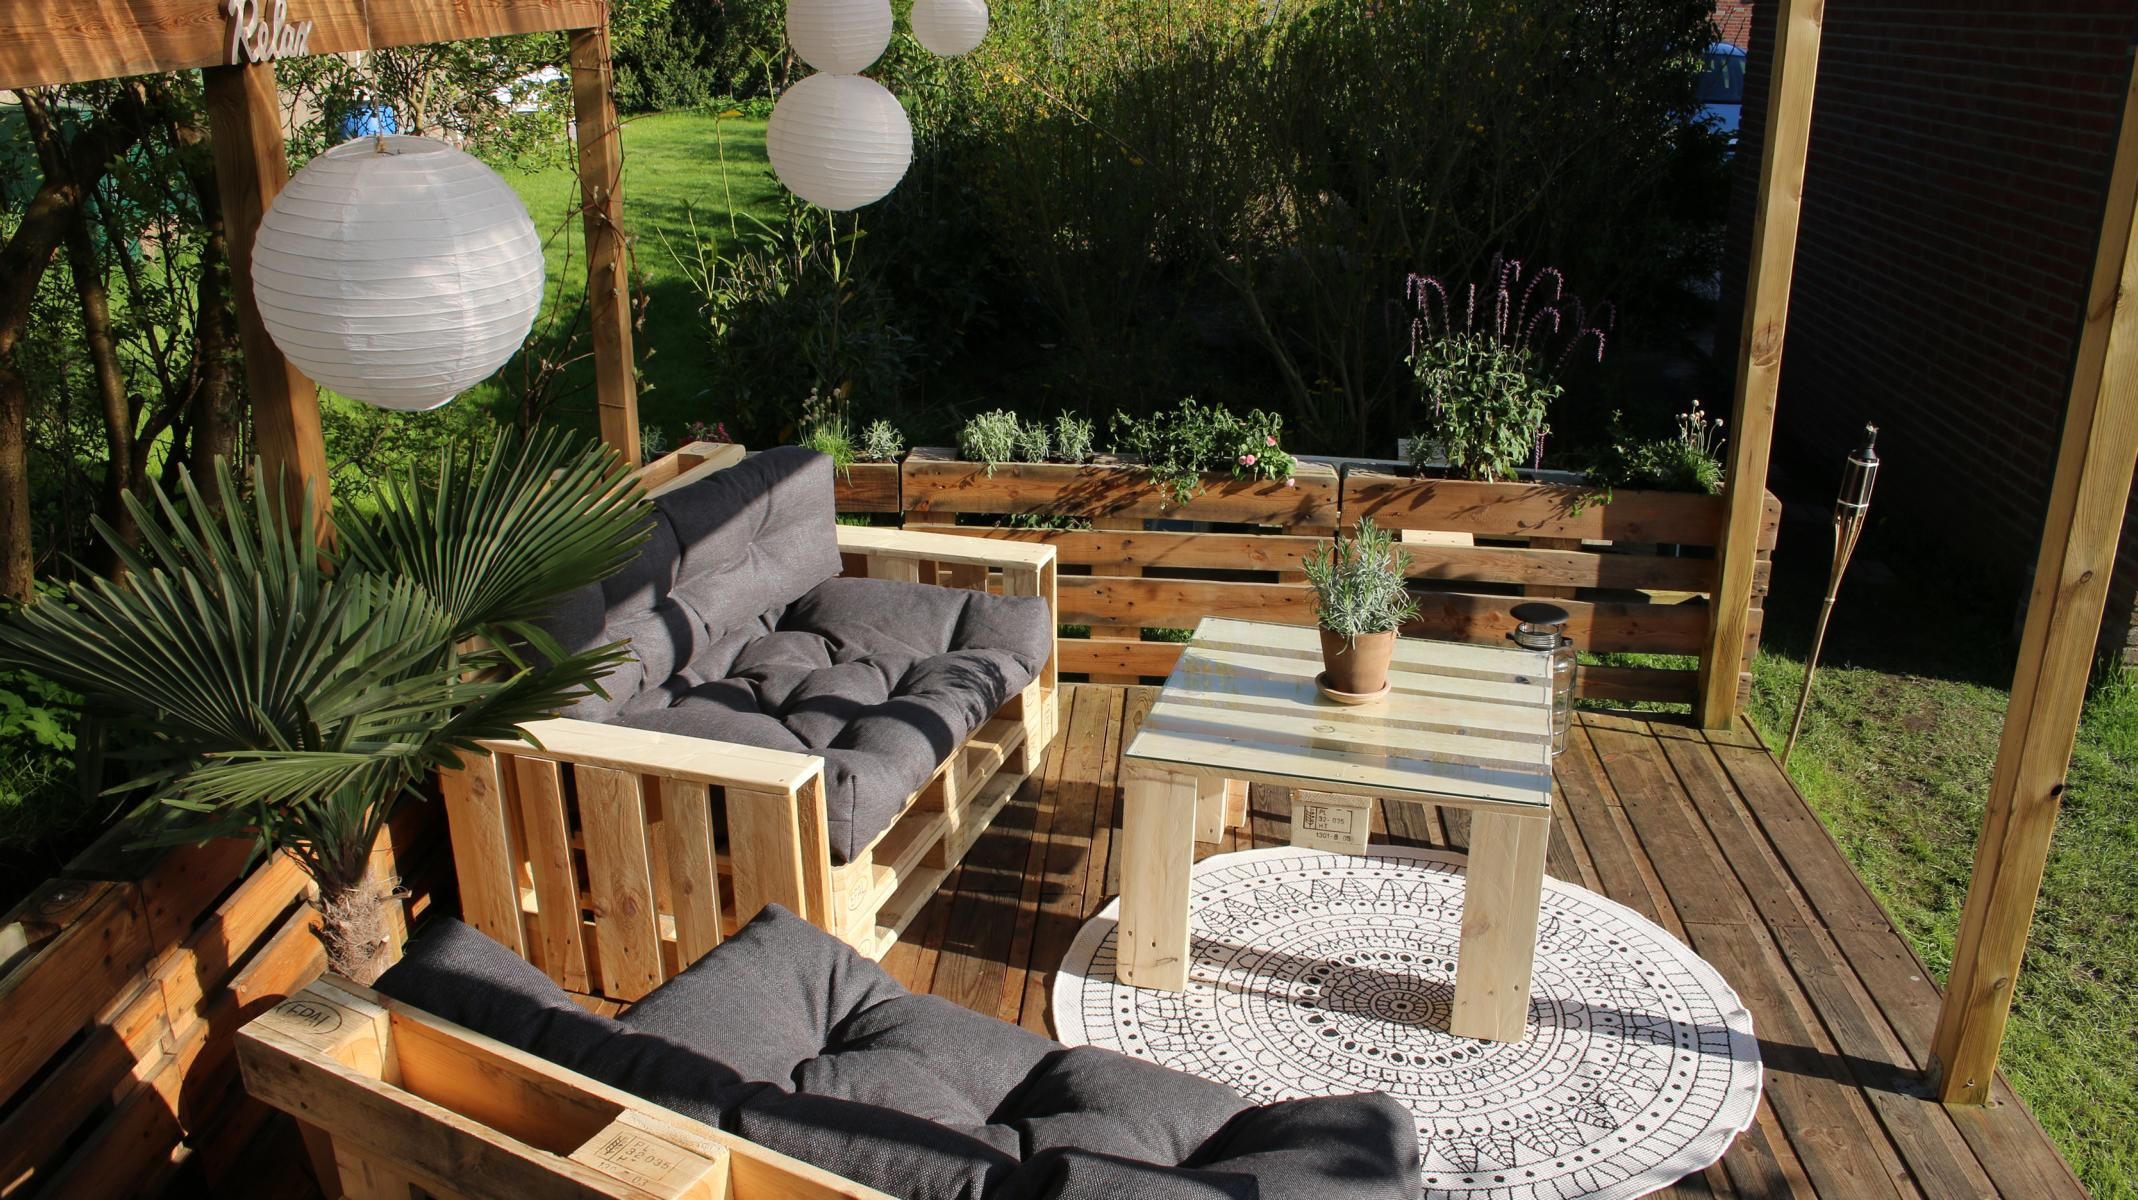 Paletten Möbel in Gruppen - Gartenmöbel Ideen